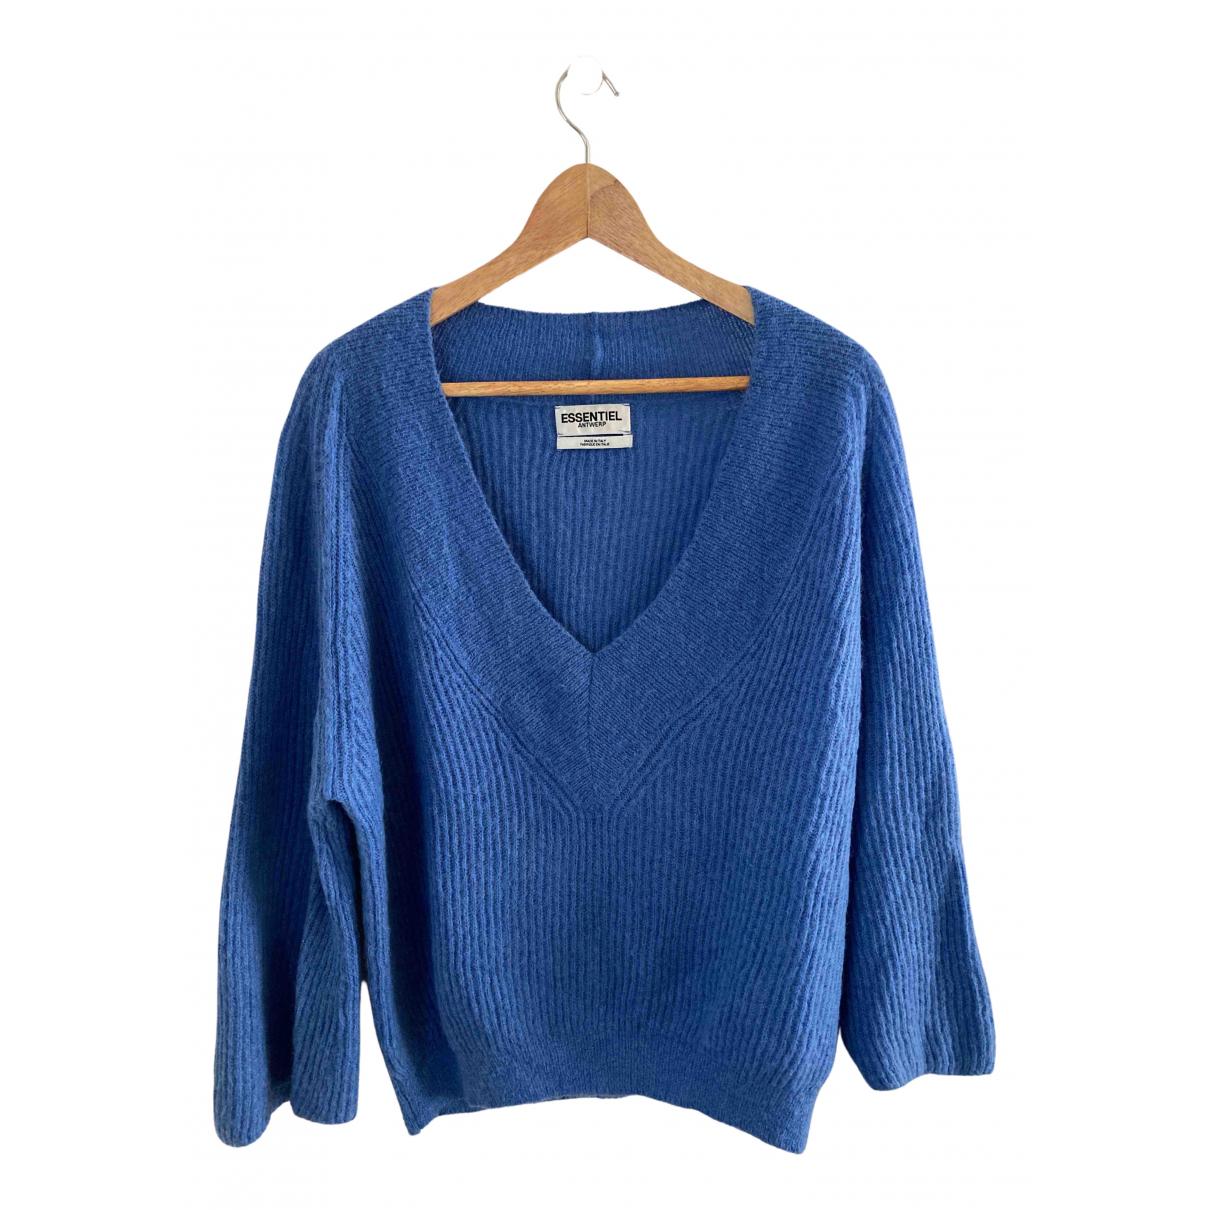 Essentiel Antwerp - Pull   pour femme - bleu